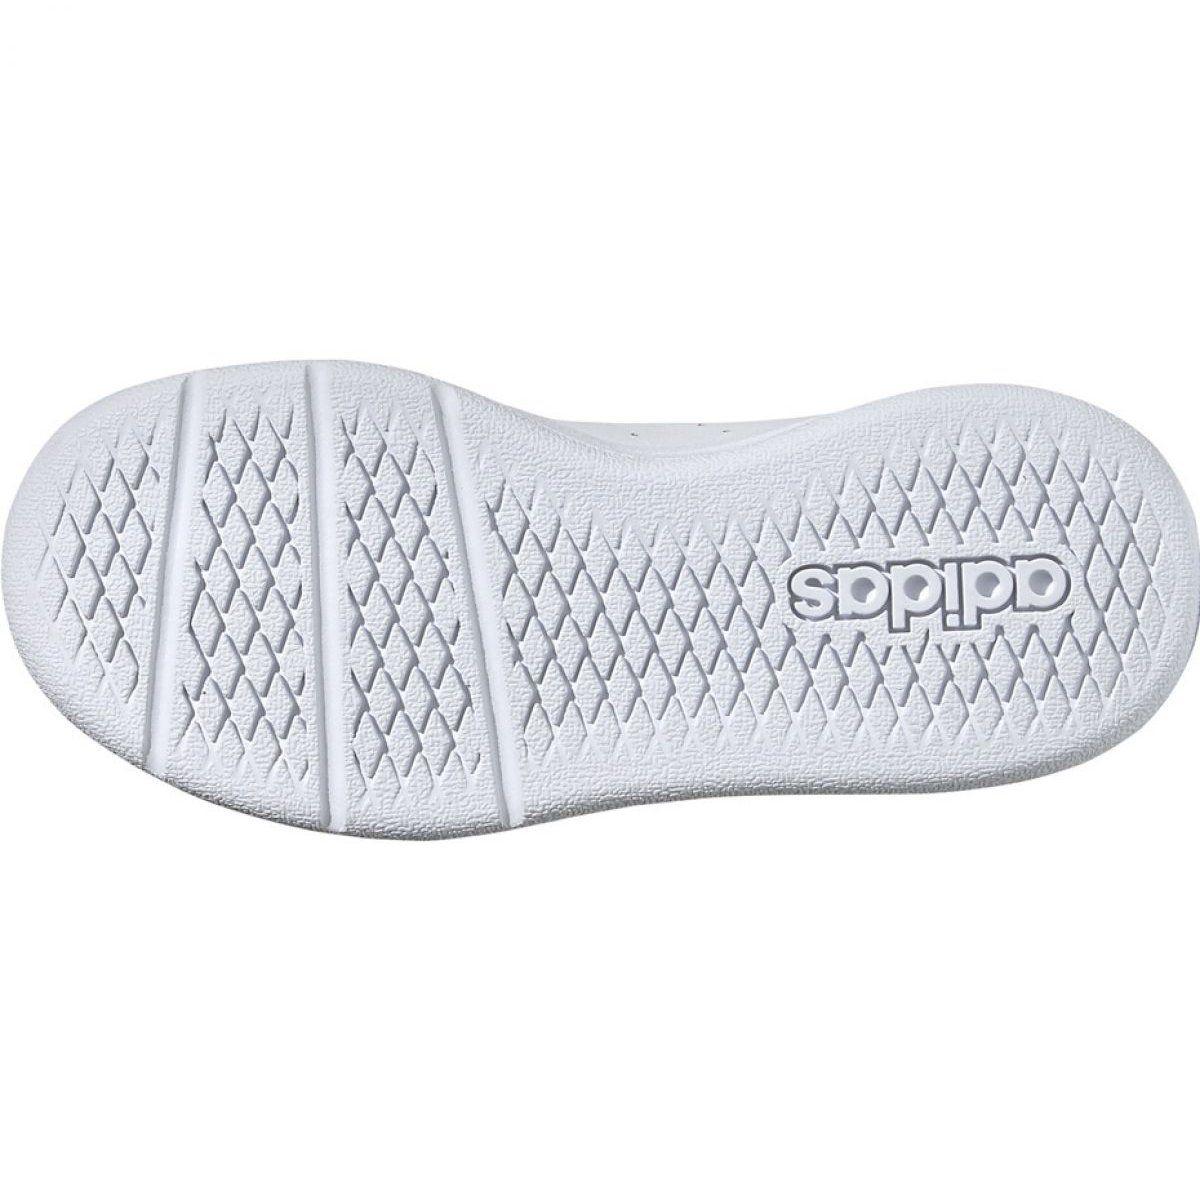 Adidas Tensaur C Ef1097 Shoes White Sports Shoes Adidas Kid Shoes Shoes